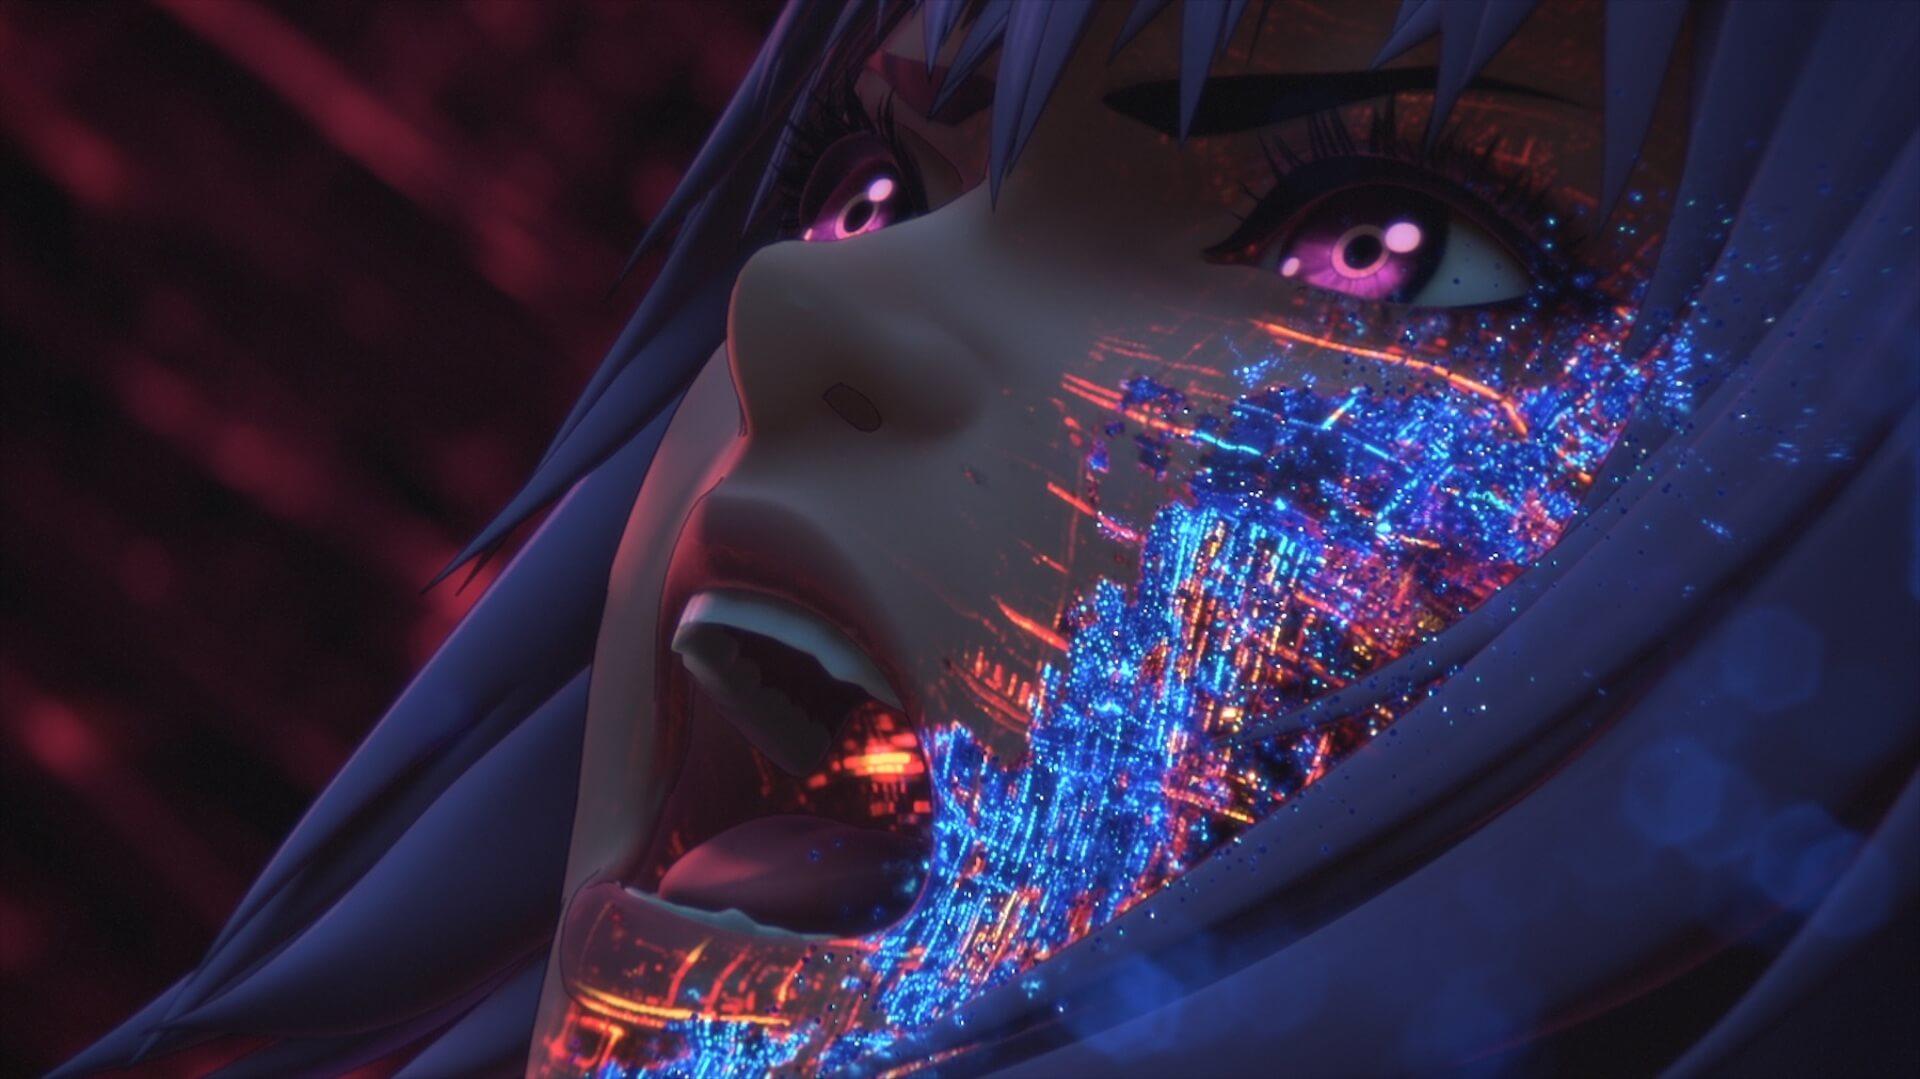 Netflix『攻殻機動隊 SAC_2045』シーズン2制作が決定!草薙素子が躍動するシーズン1の本編映像も解禁 art200420_ghostintheshell_1